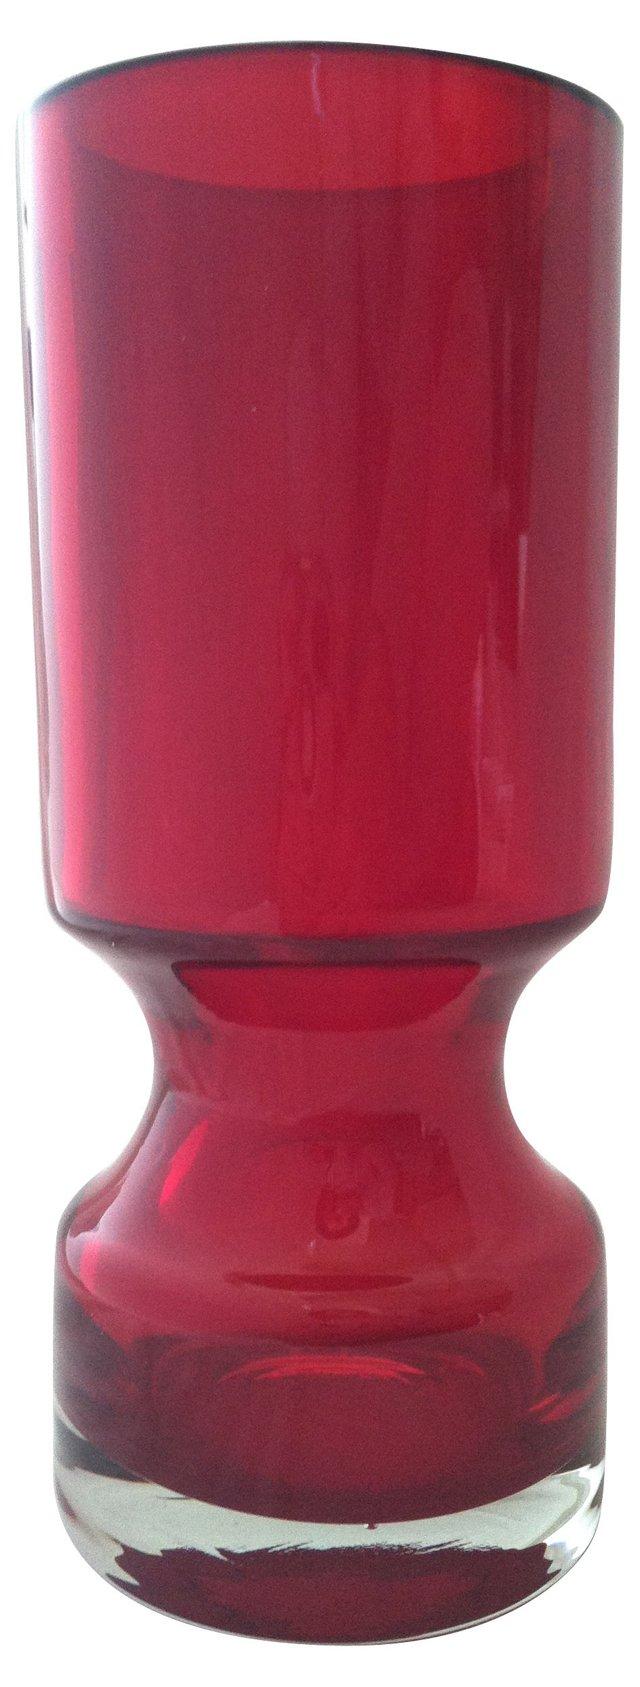 1970s Finnish Cranberry Vase